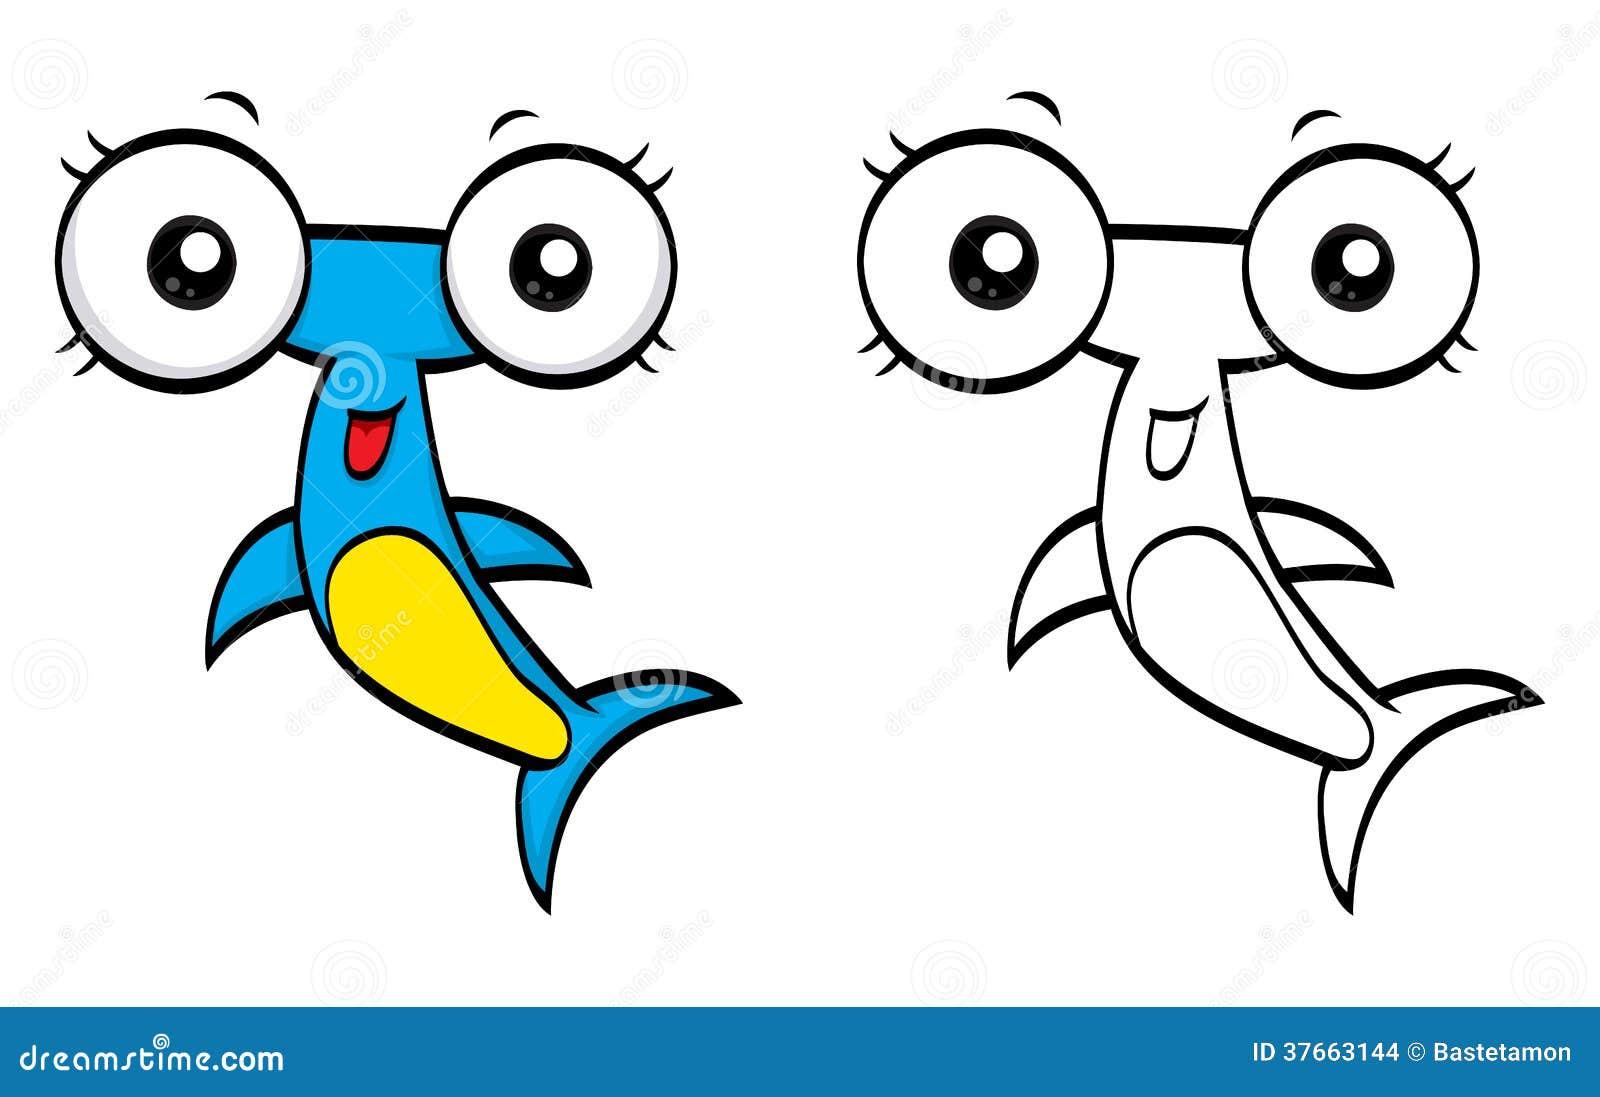 Cartoon Hammerhead Stock Images - Image: 37663144